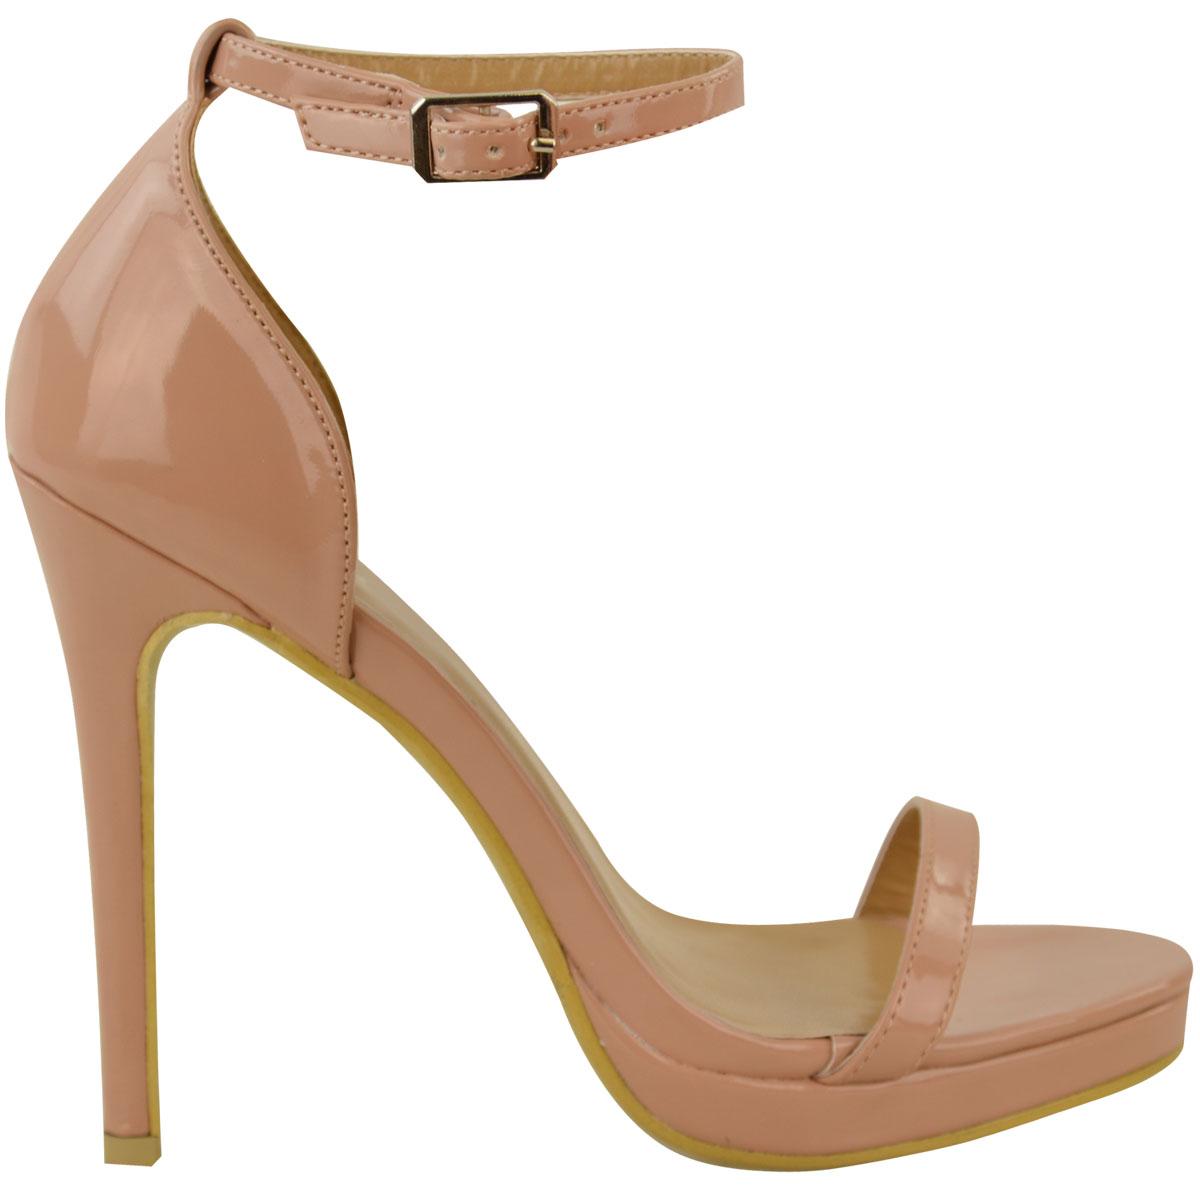 Topshop - Women's Clothing Women's Fashion Fashion ankle cuff sandals